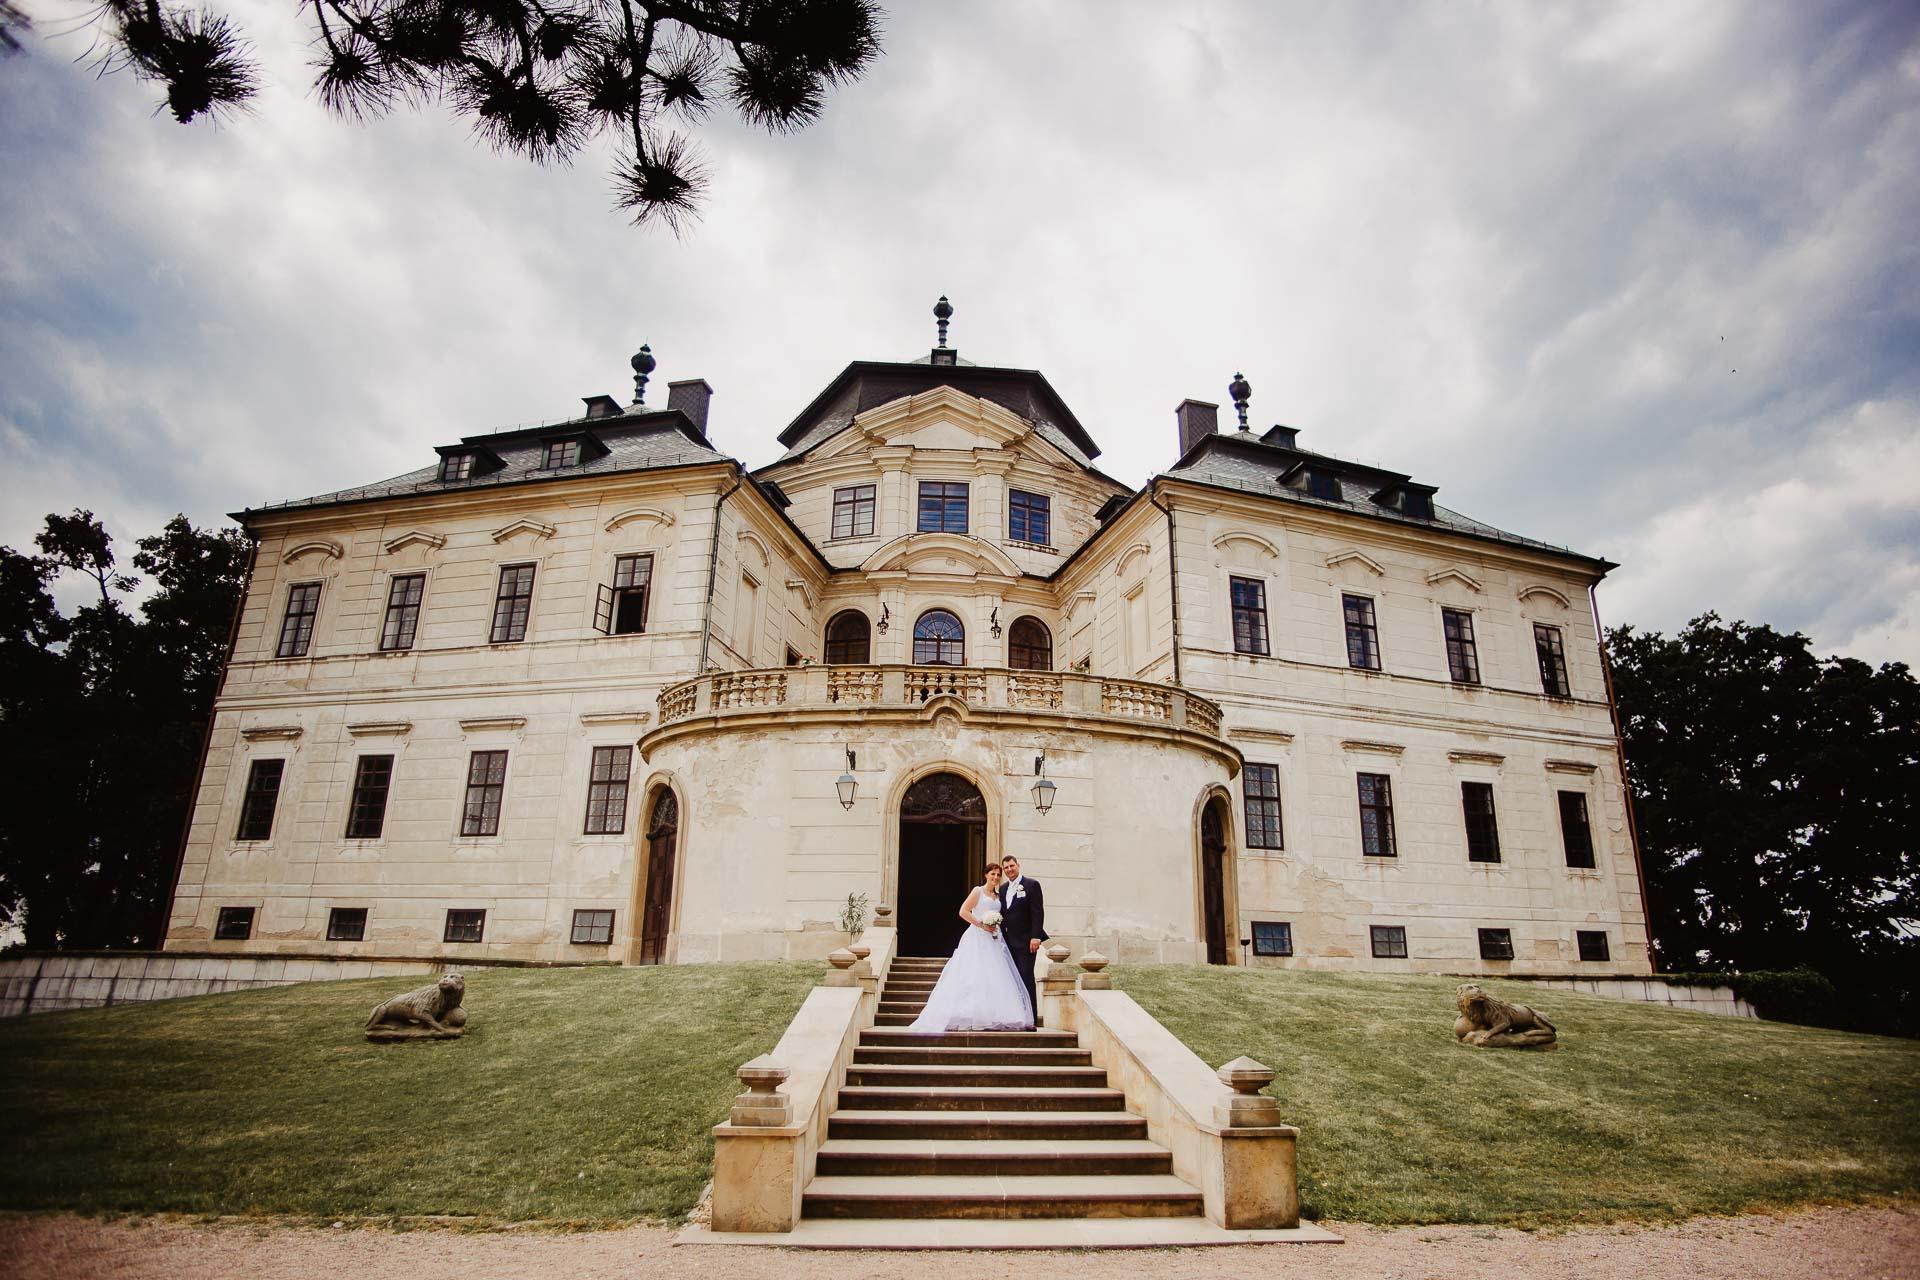 Svatební-fotograf-zámek-Karlova-Koruna-Chlumec-nad-Cidlinou-187